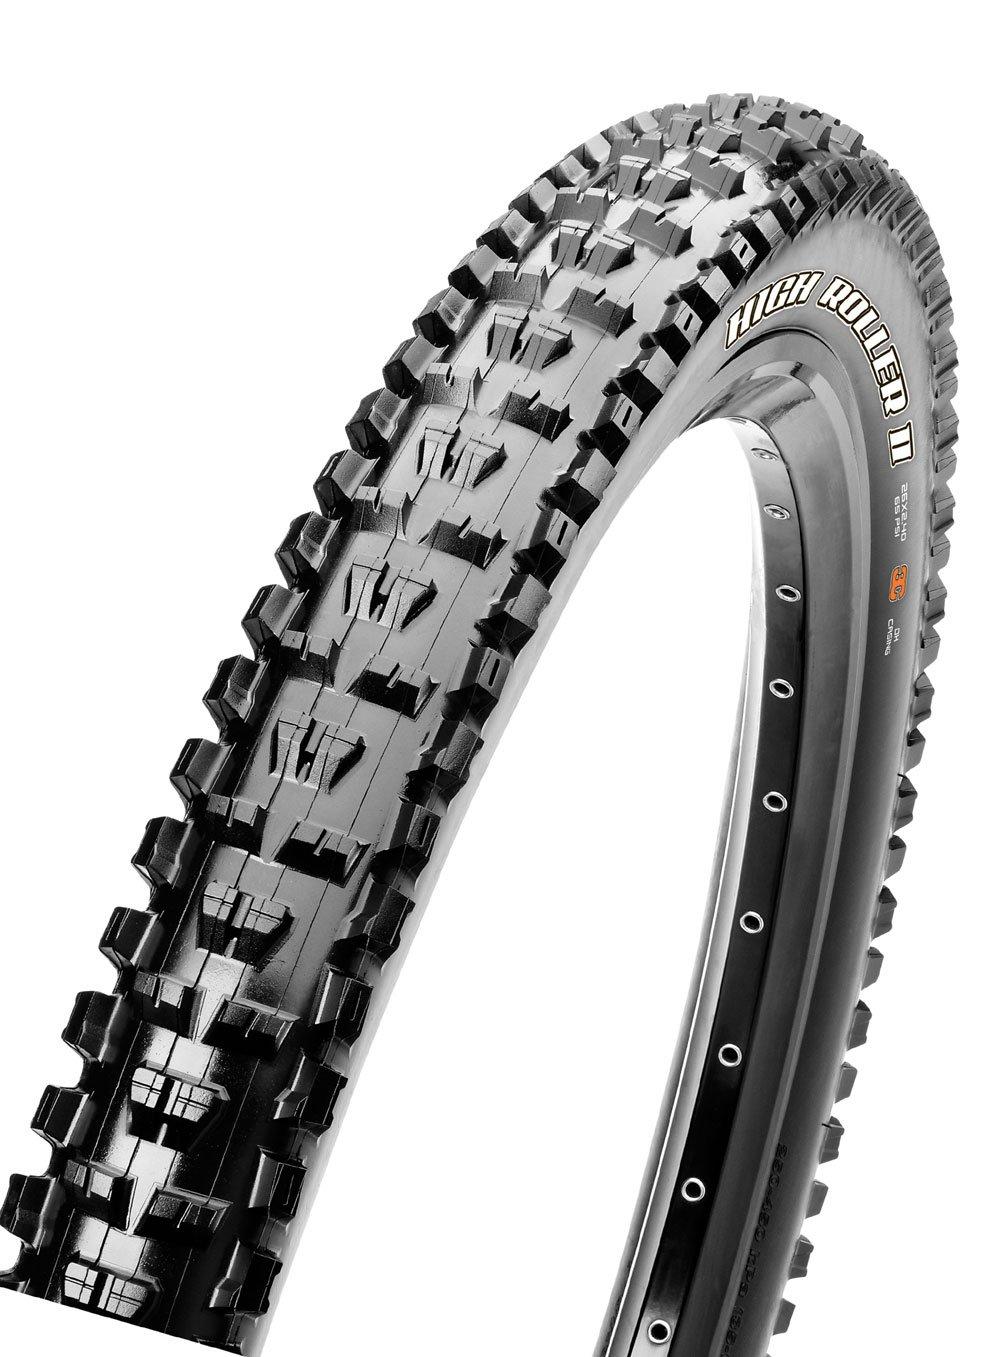 Maxxis Fahrrad Reifen HighRoller II 3C MaxxGrip    alle Größen